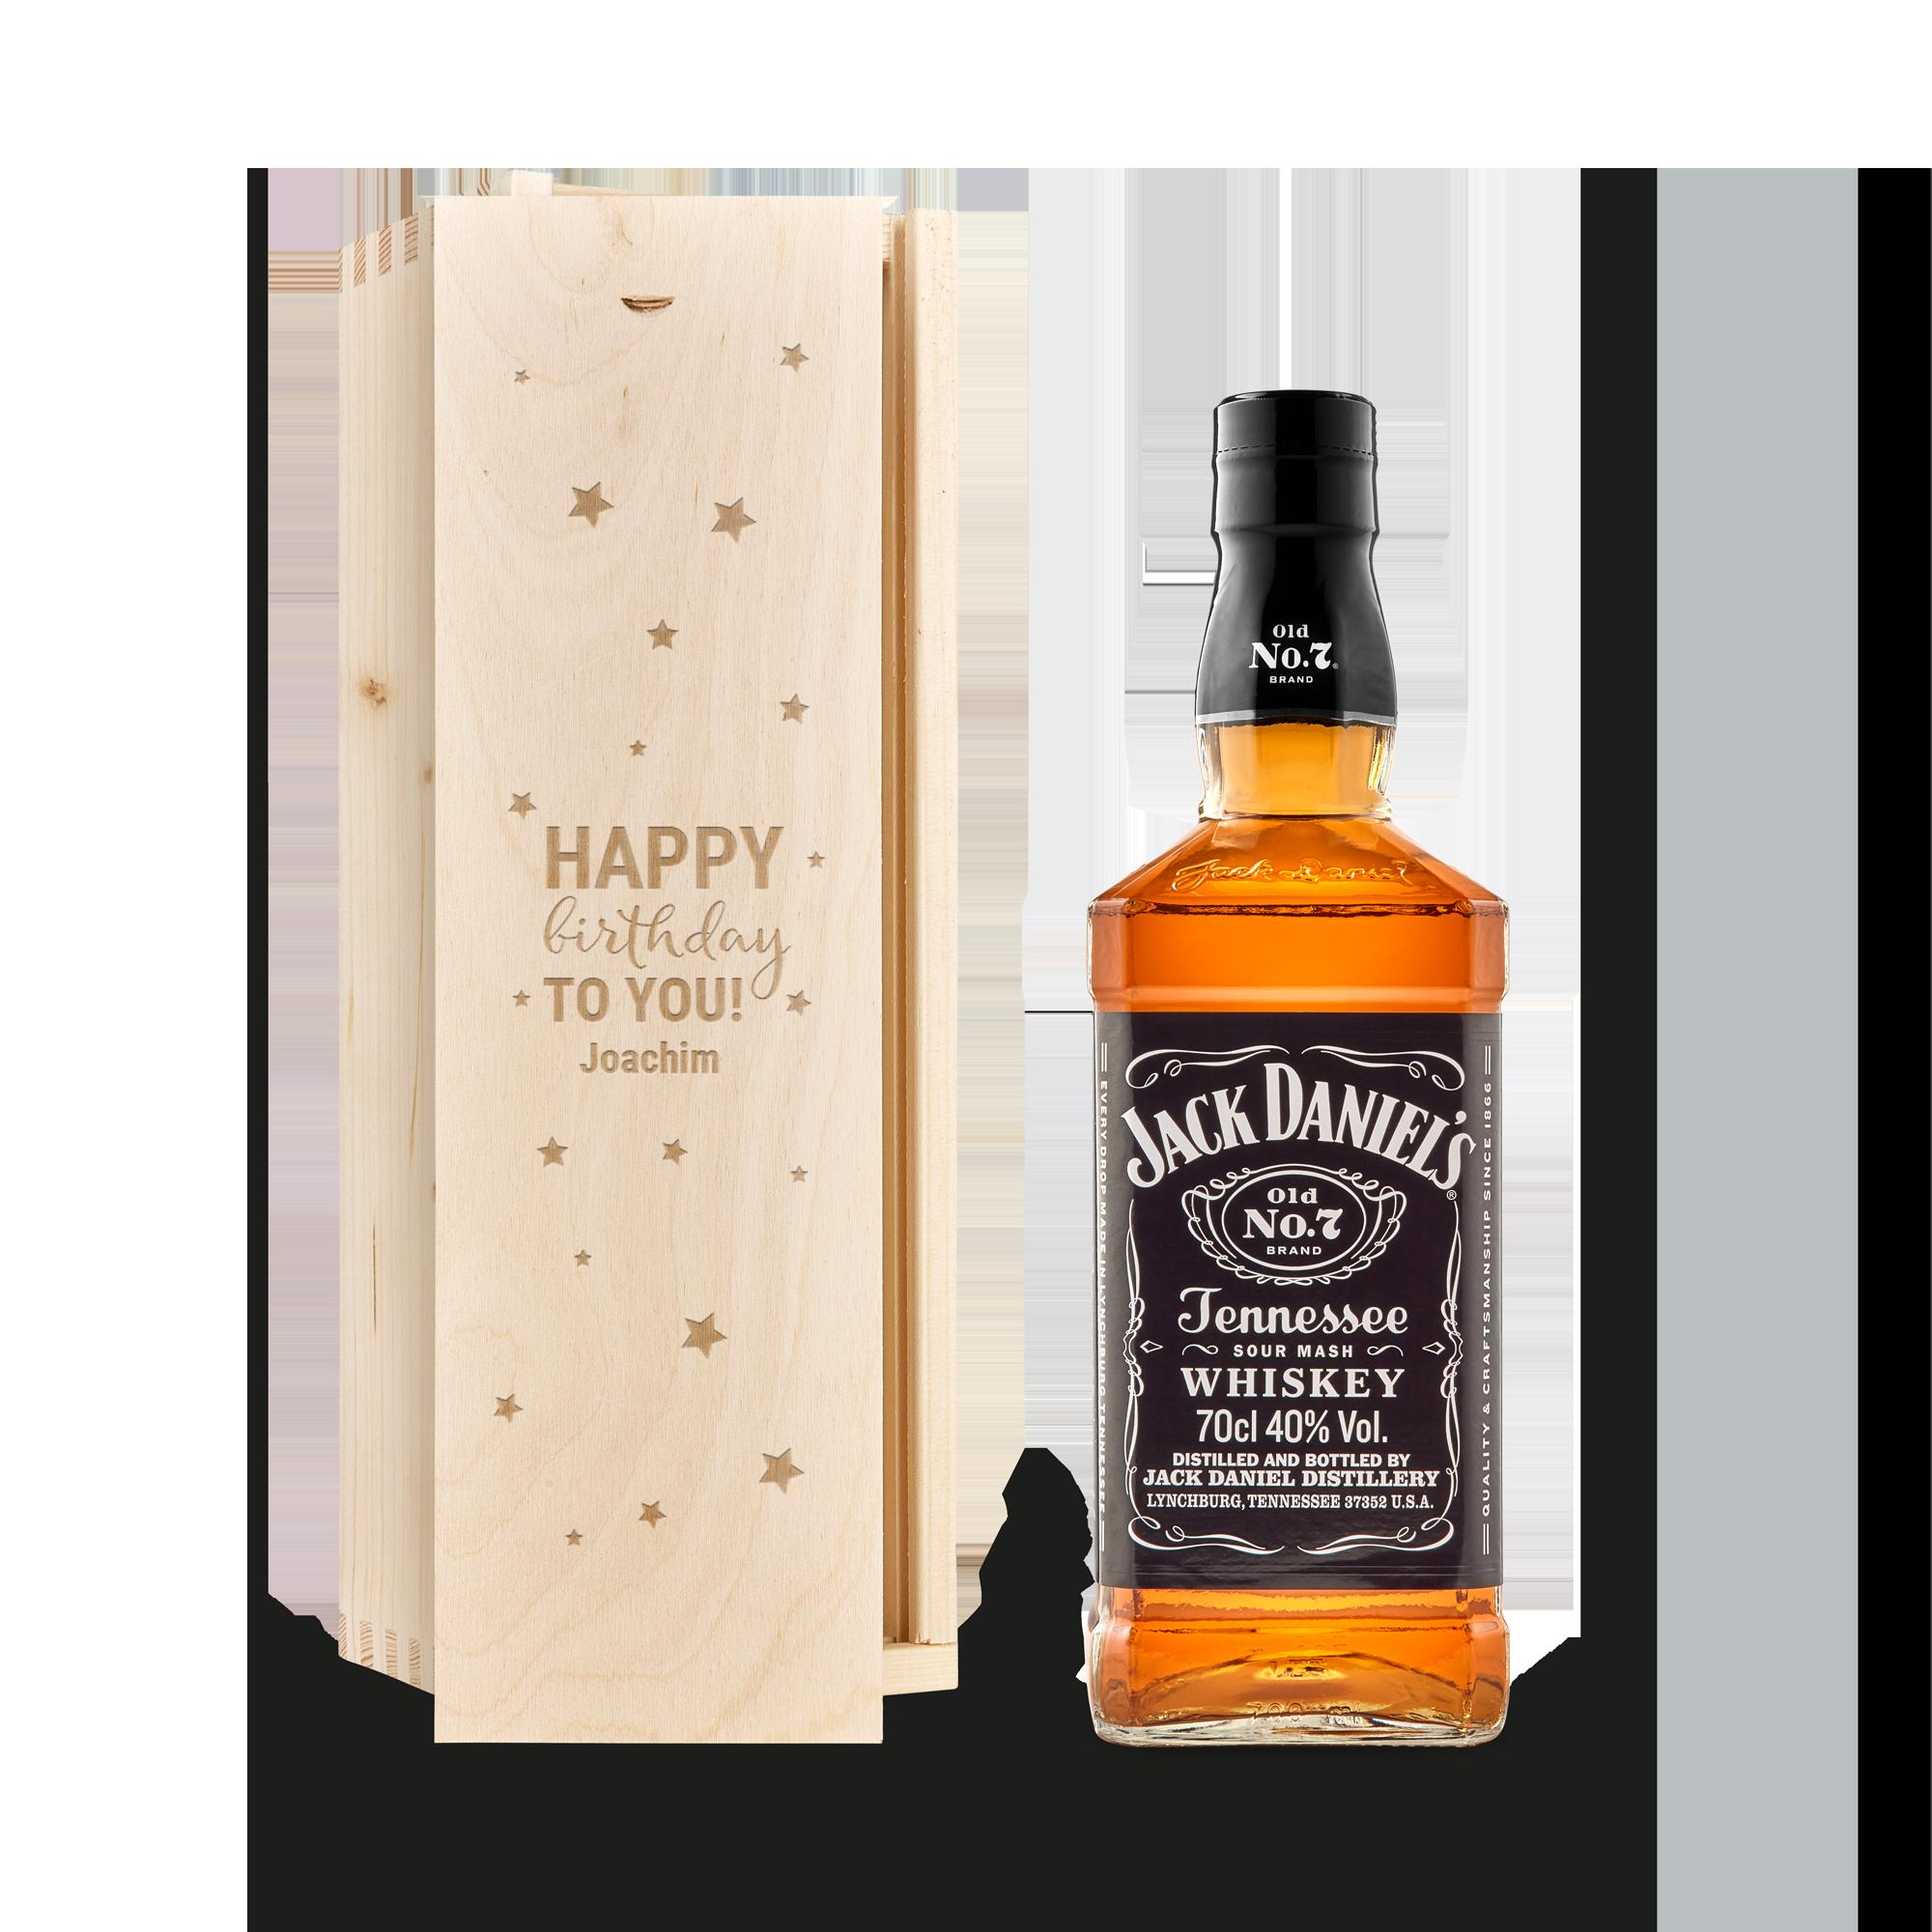 Individuellleckereien - Jack Daniels Whisky in gravierter Kiste - Onlineshop YourSurprise